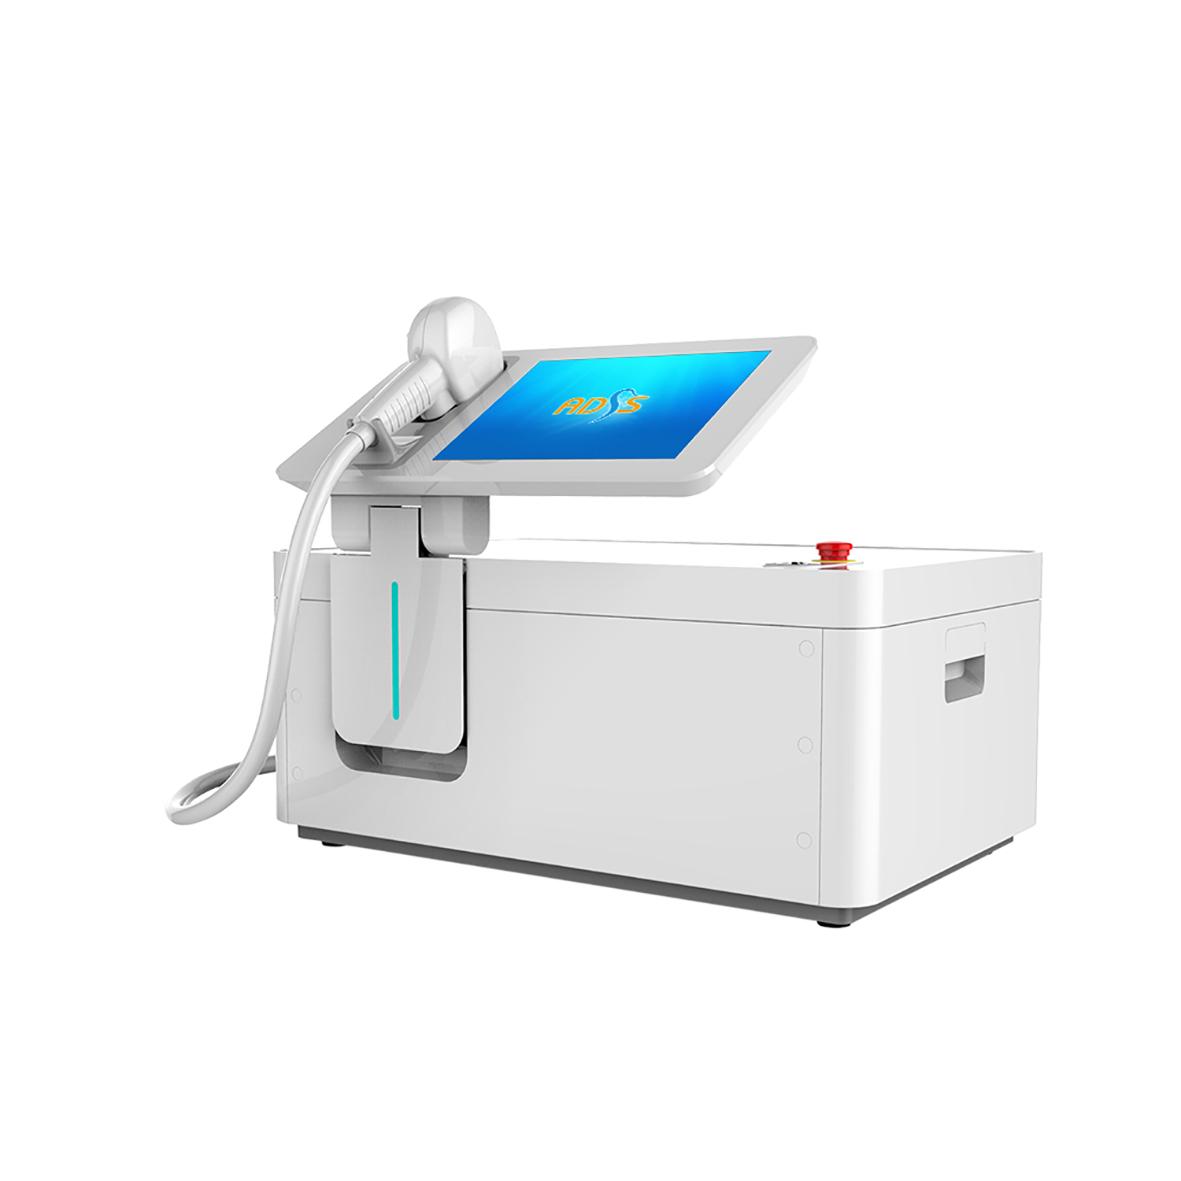 Máquina de Fibra depilación láser images